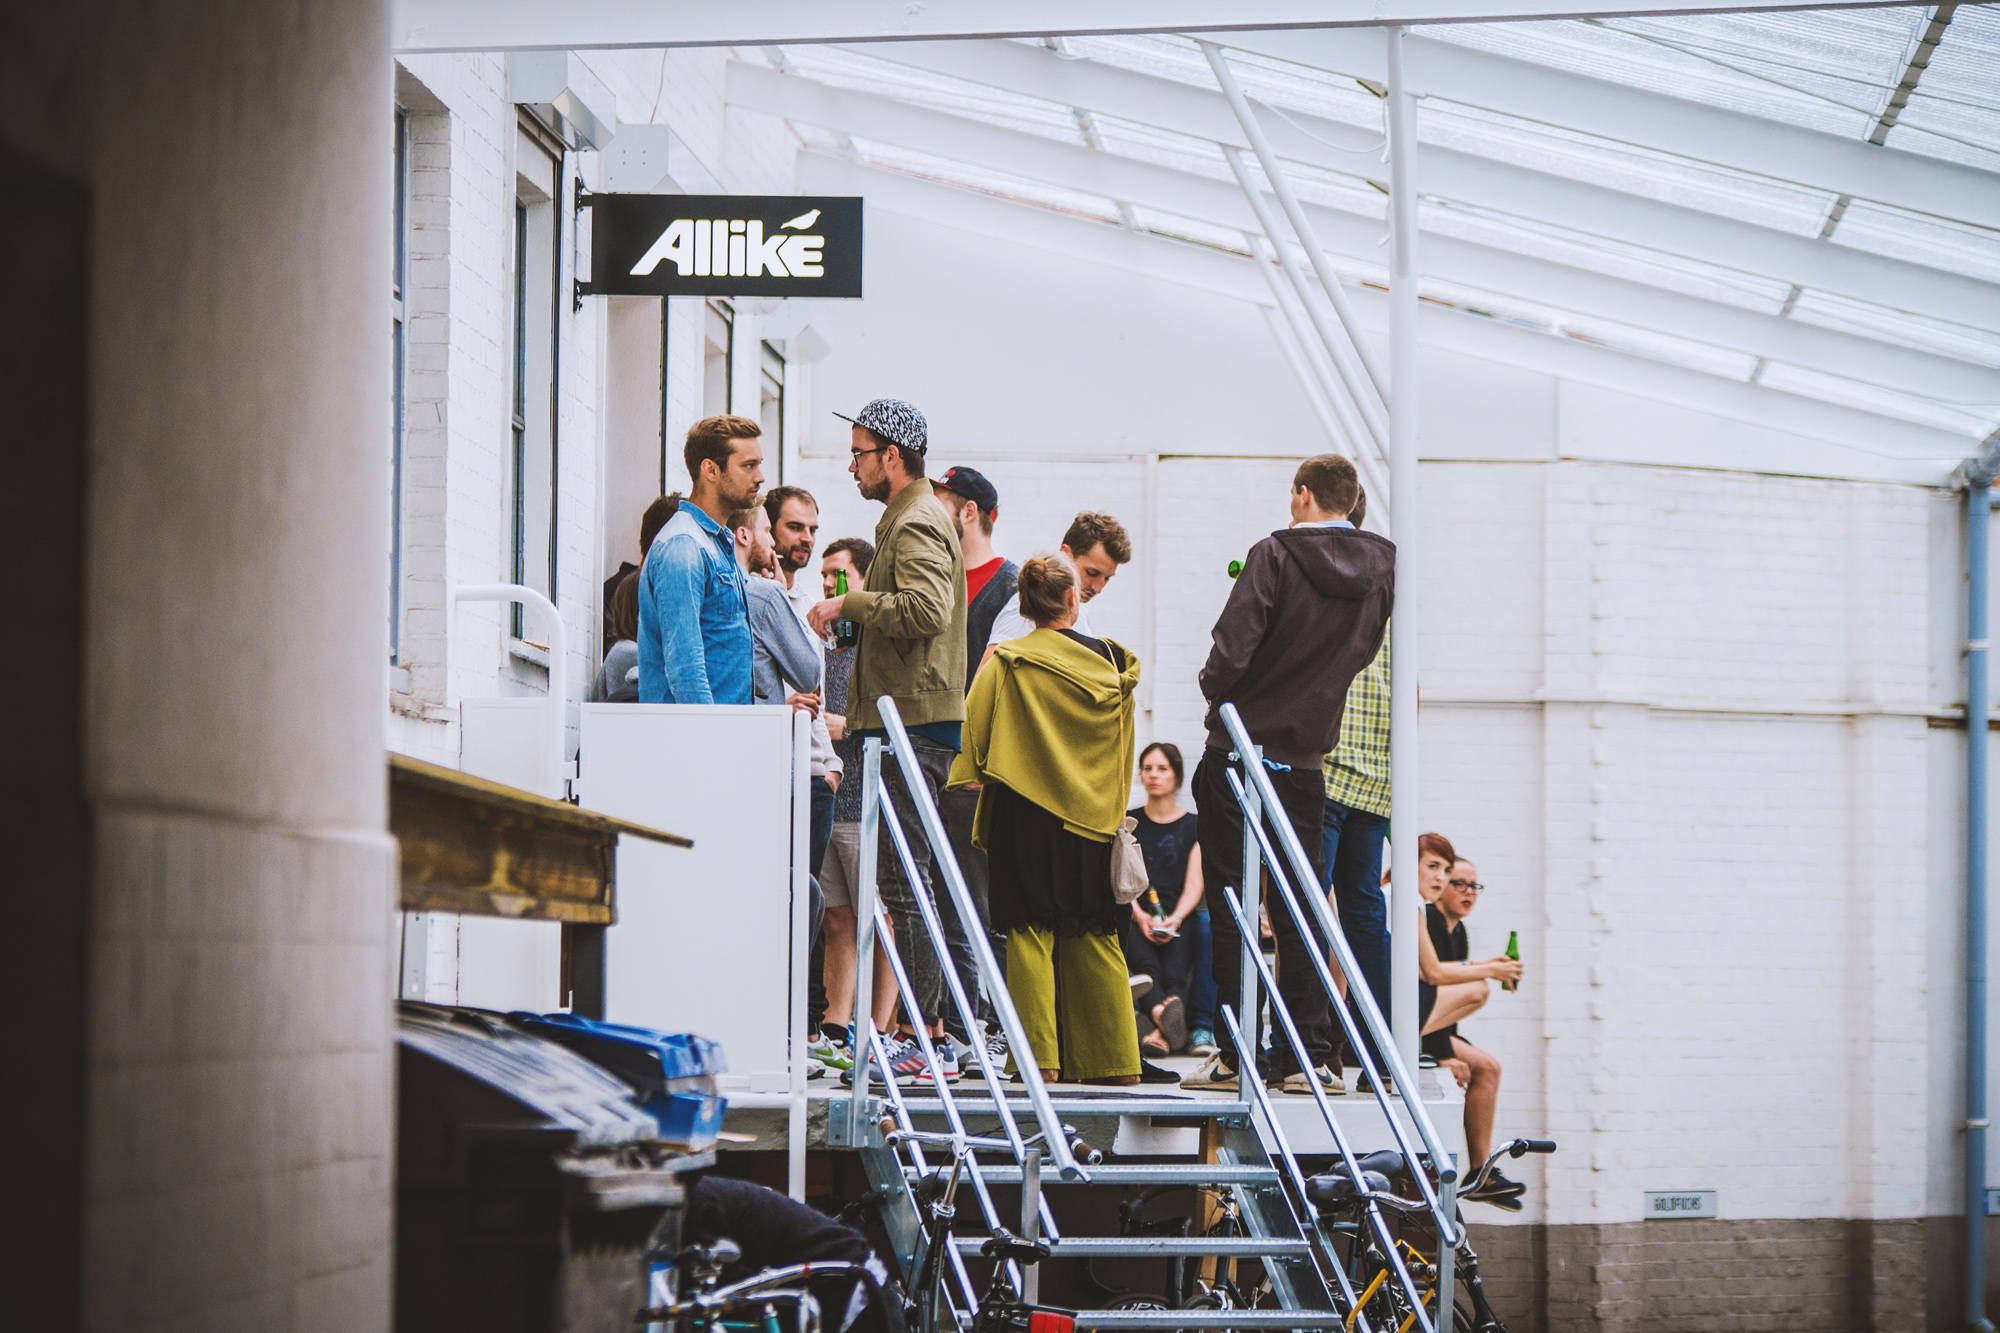 Allike Concept & Sneaker Store in Hamburg-Altona